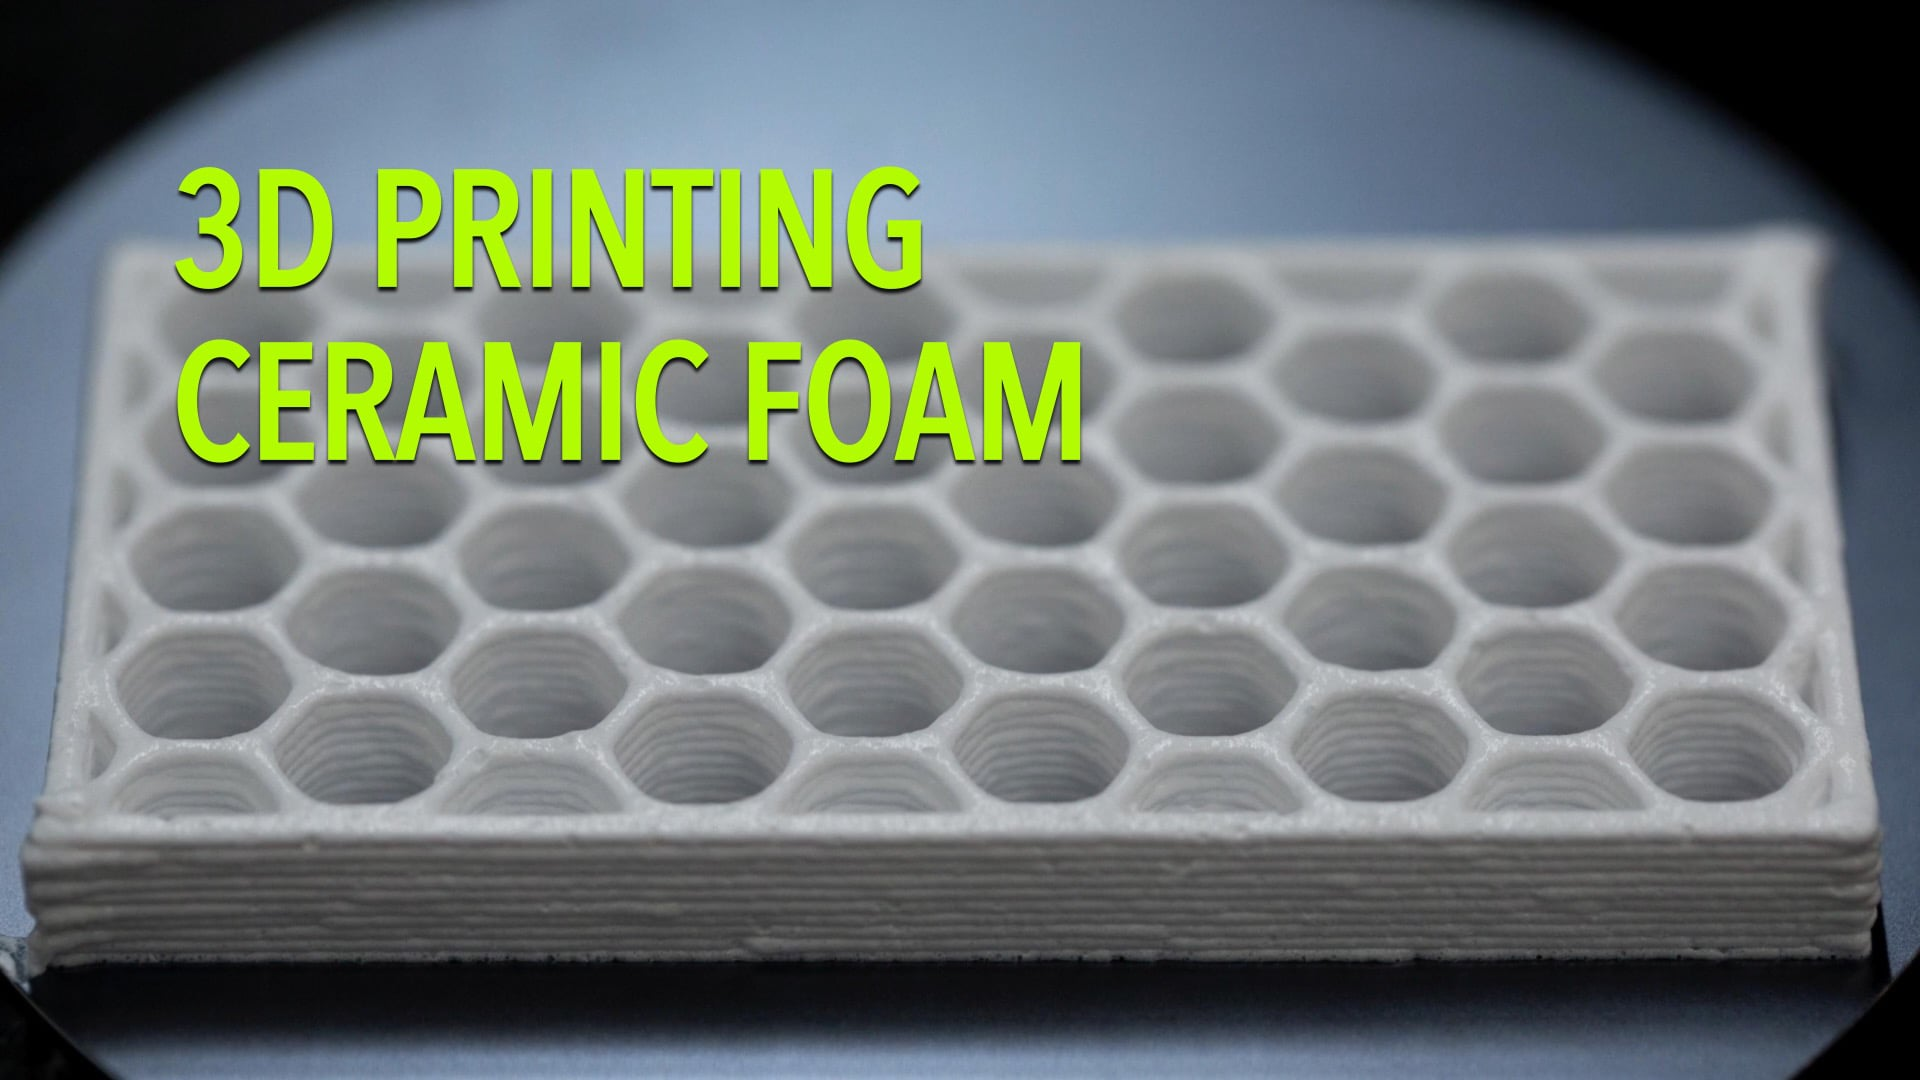 3D Printing Ceramic Foam